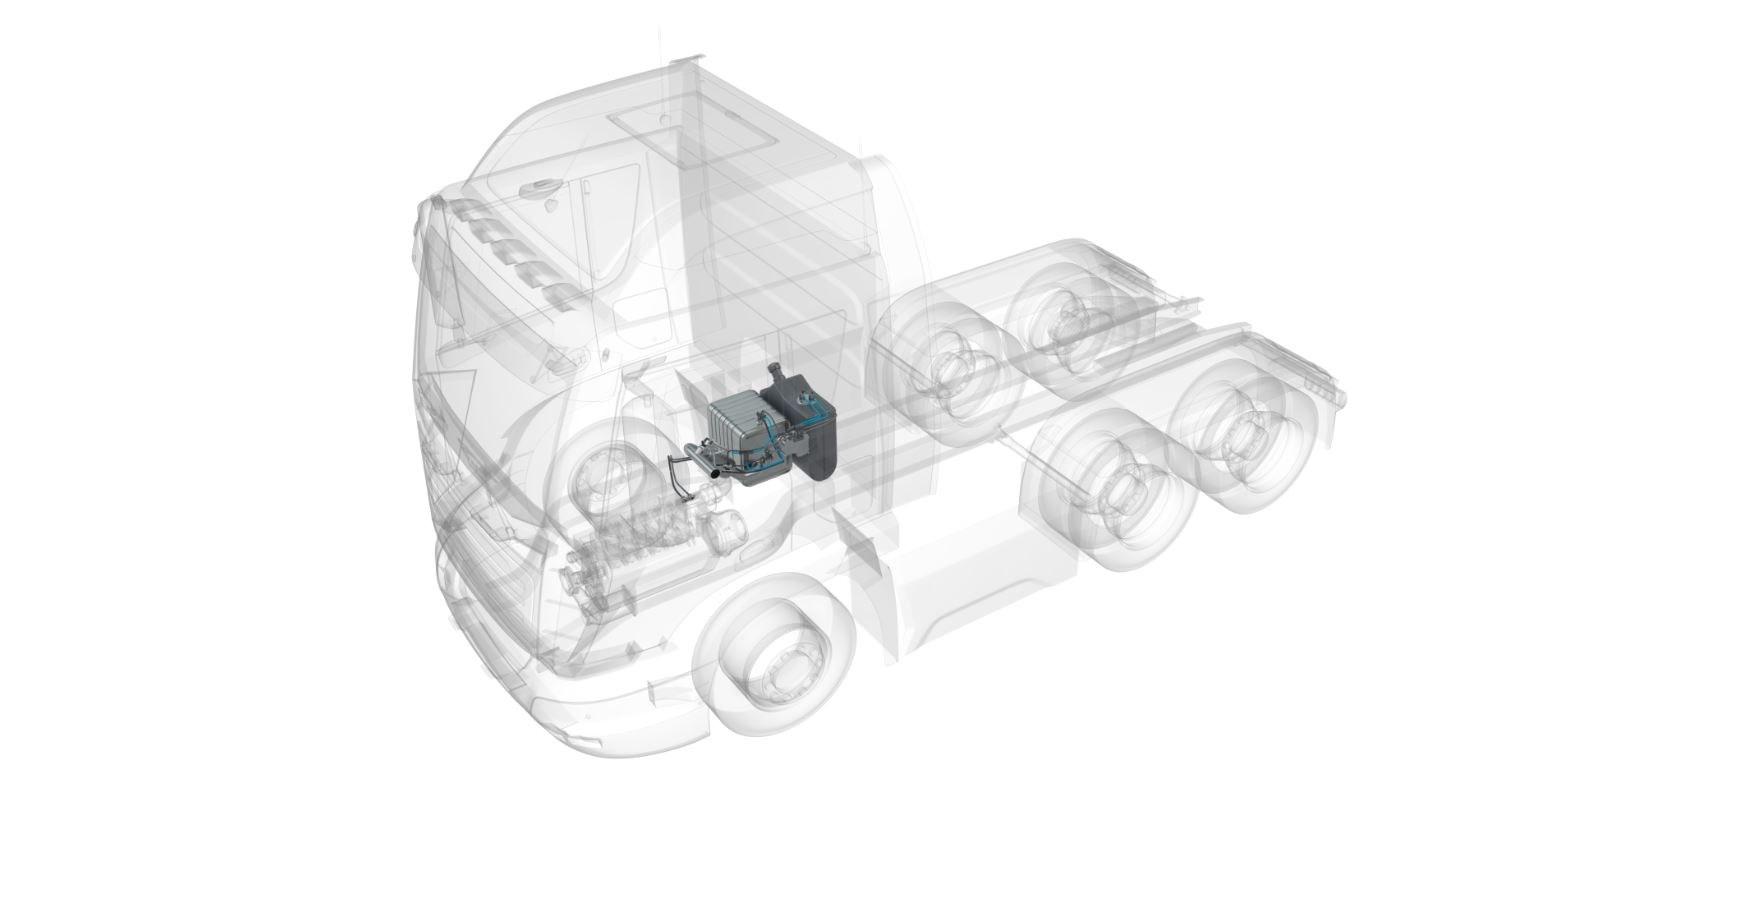 Truck SCR Elec Heated System Website